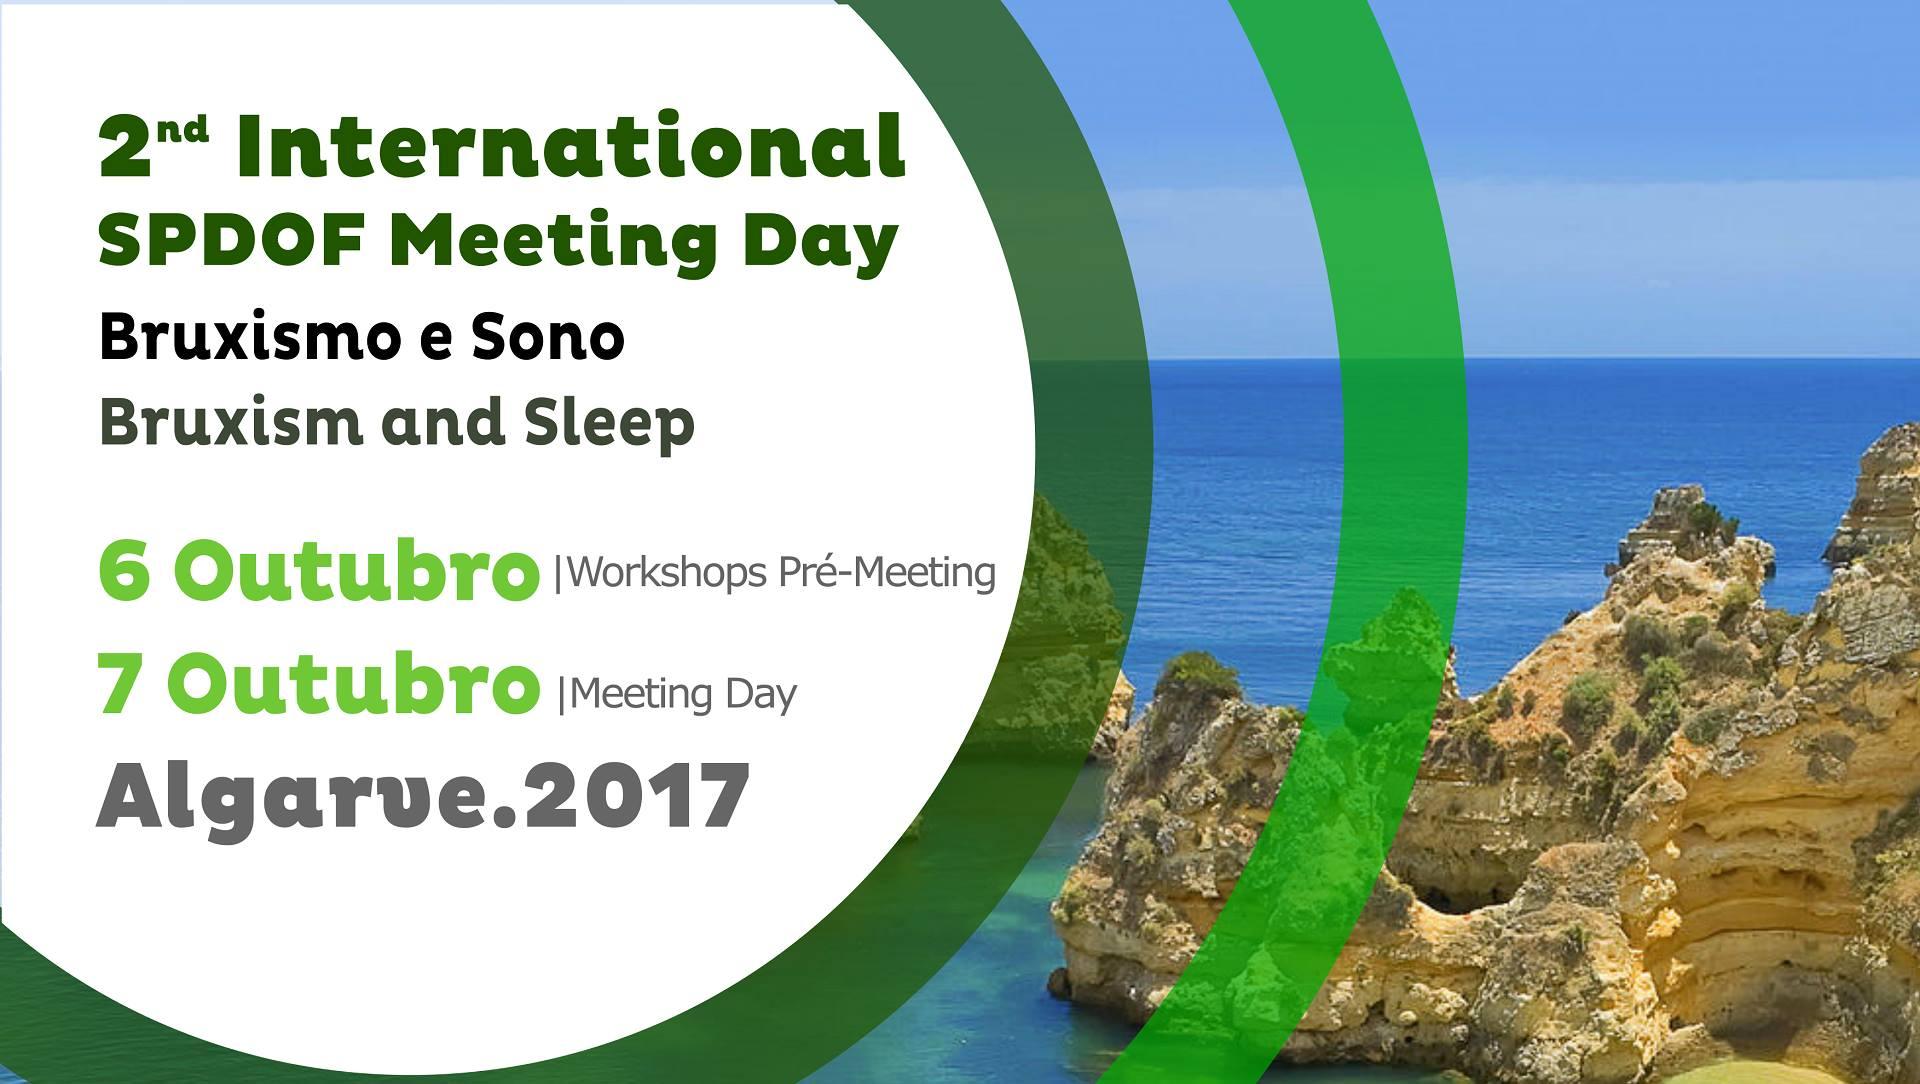 Imagem da notícia: Algarve acolhe 2nd International SPDOF Meeting Day